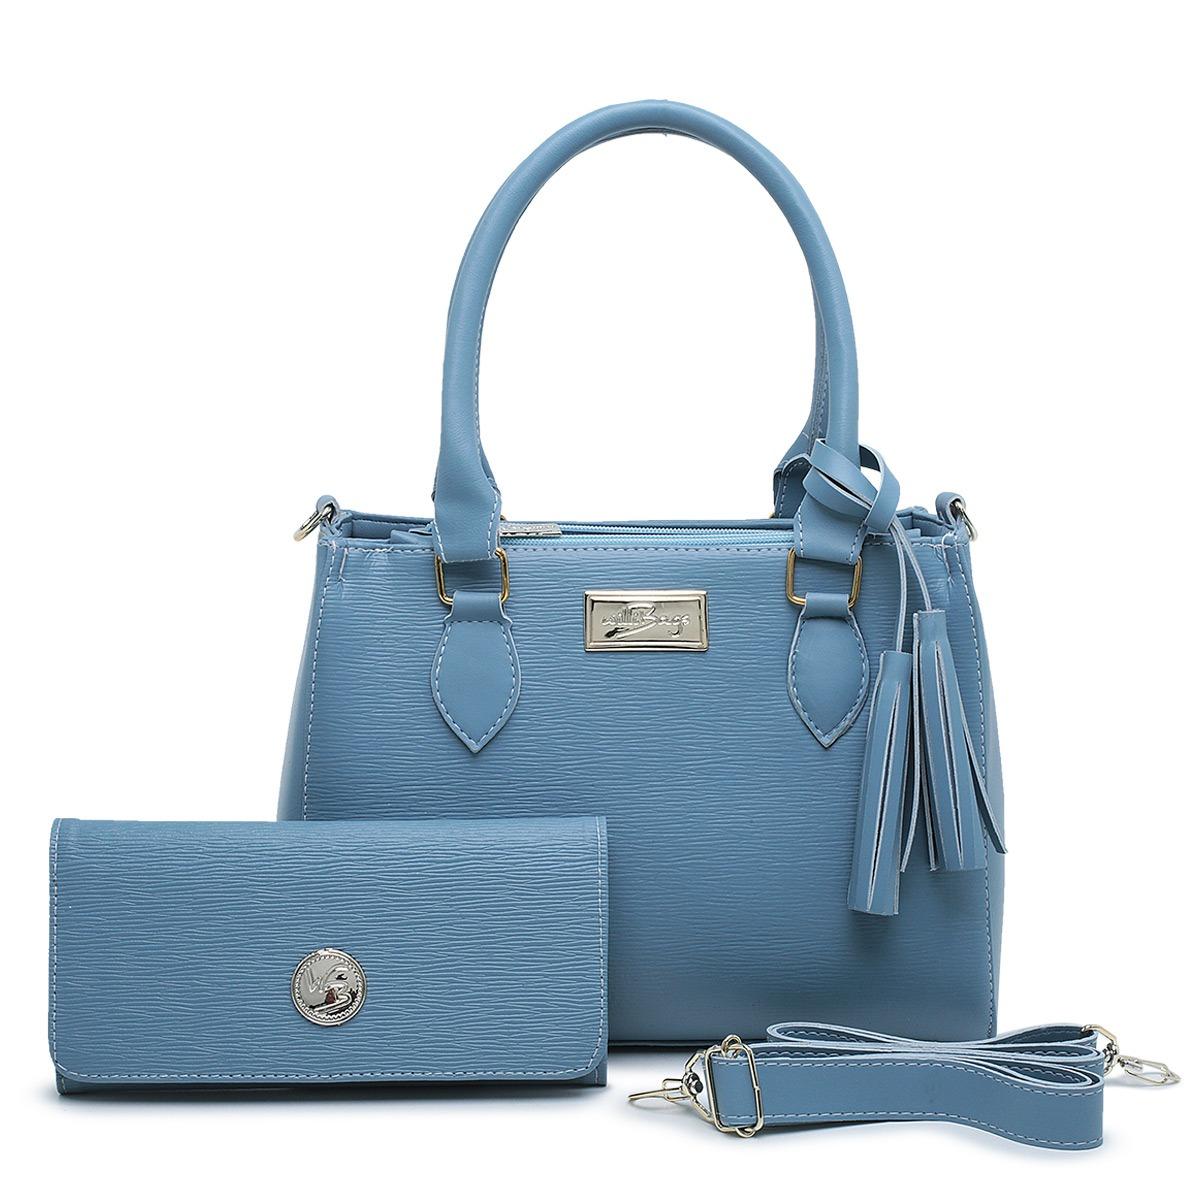 Kit  Bolsa Com Carteira Feminina Barata Linda Transversal Azul